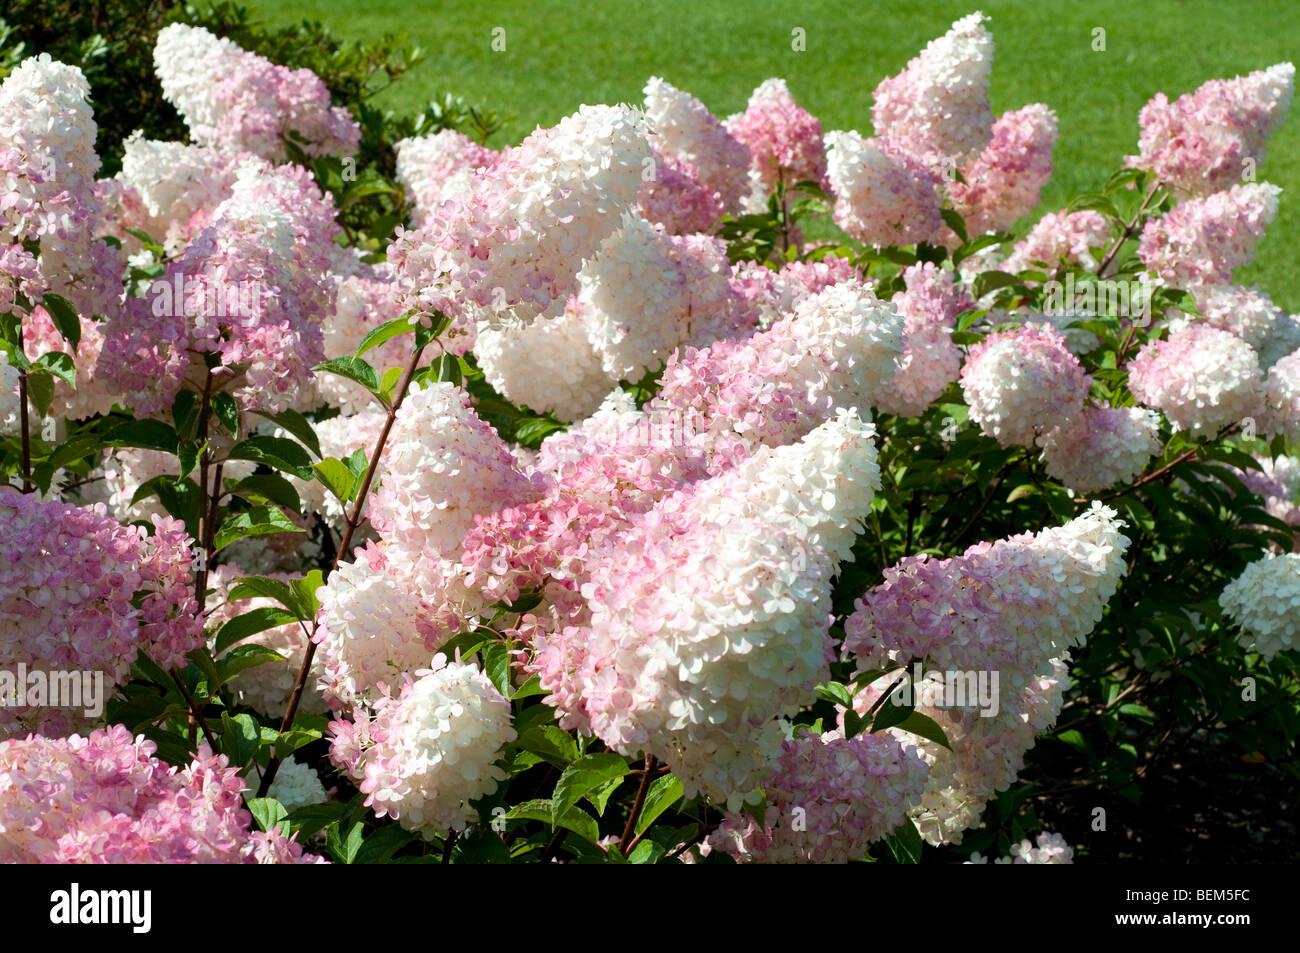 hydrangea paniculata vanille fraise renhy stock photo 26258944 alamy. Black Bedroom Furniture Sets. Home Design Ideas